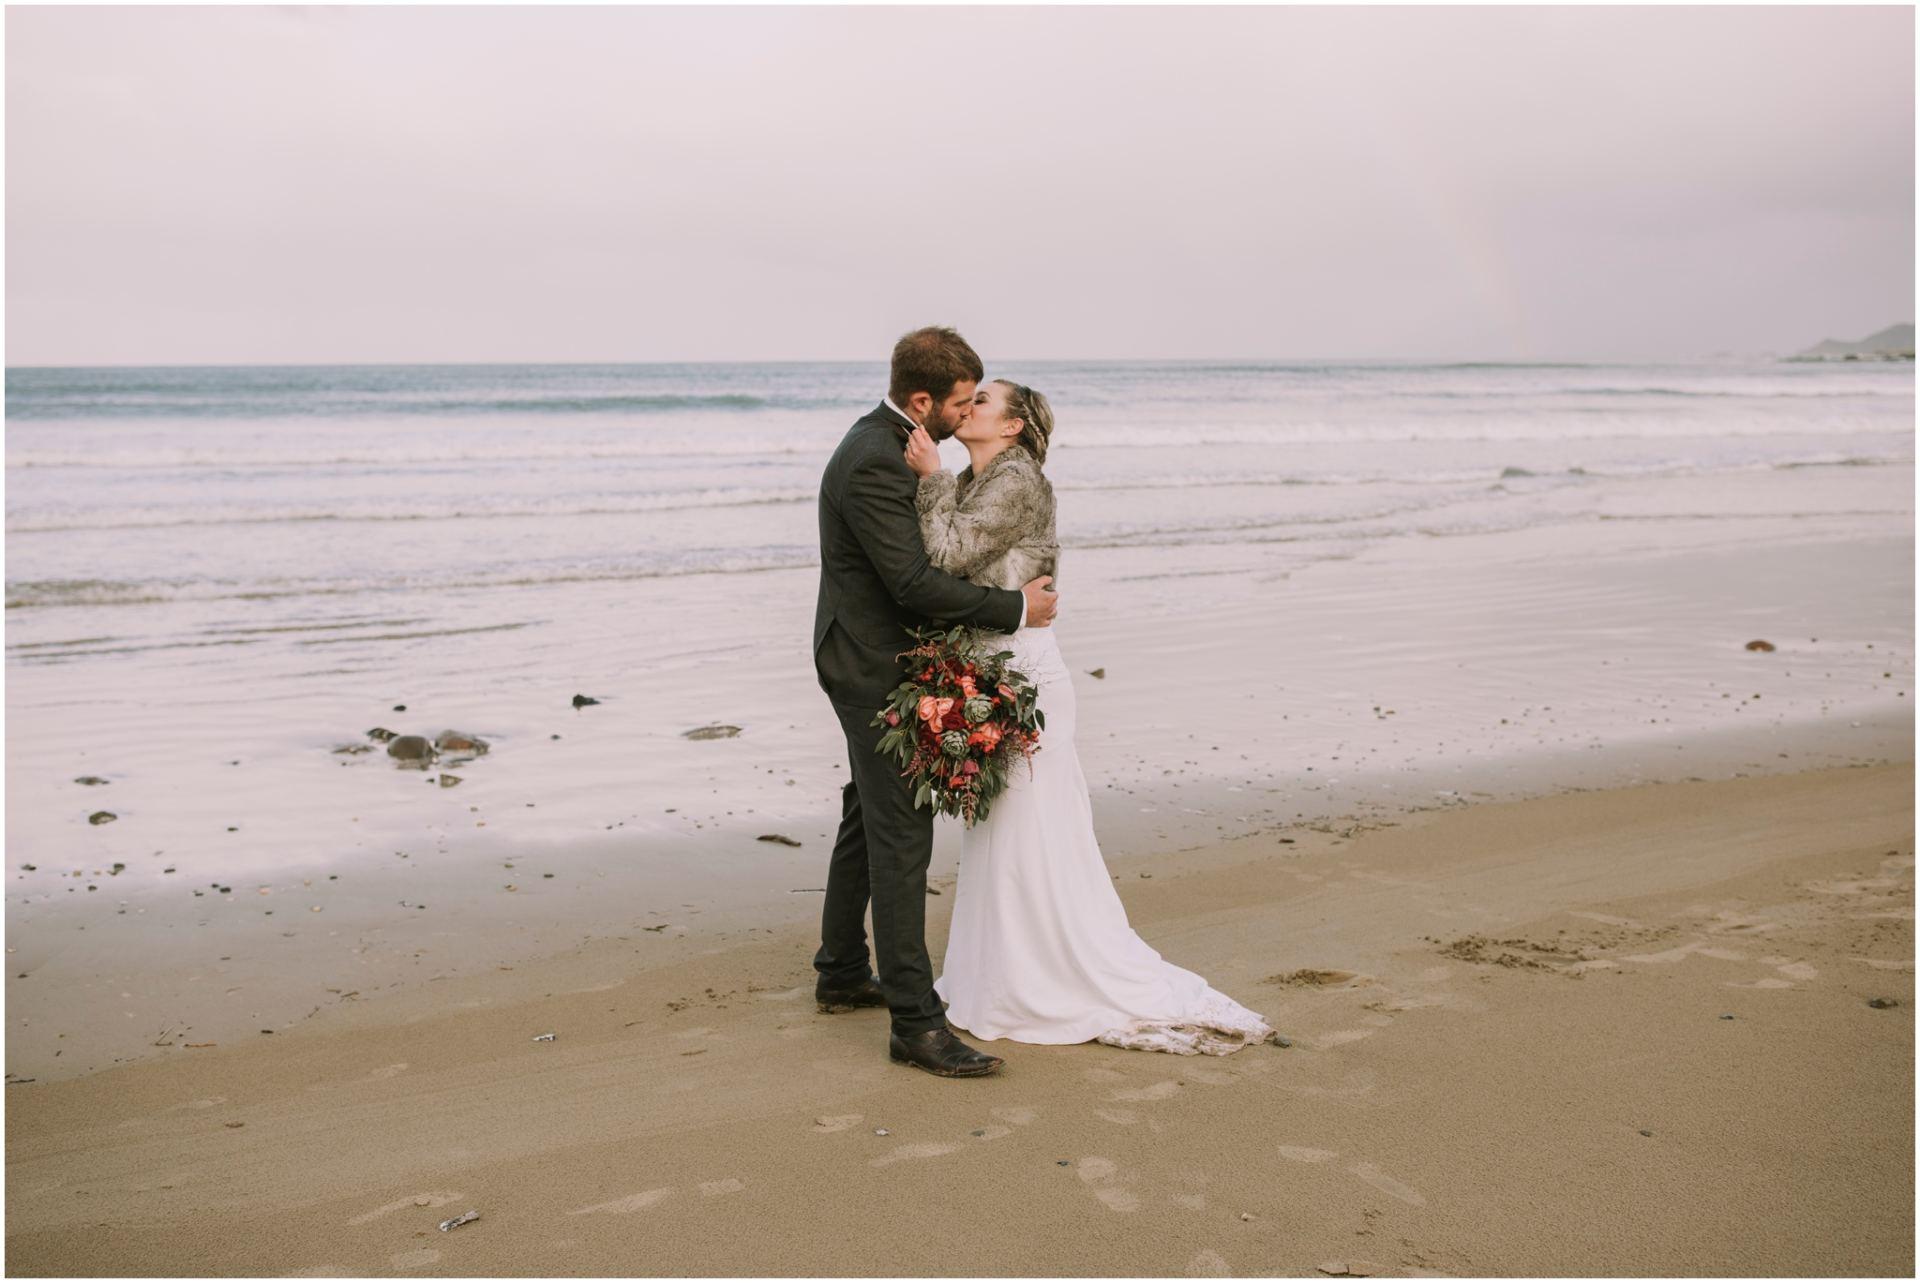 The Catlins wedding photographer